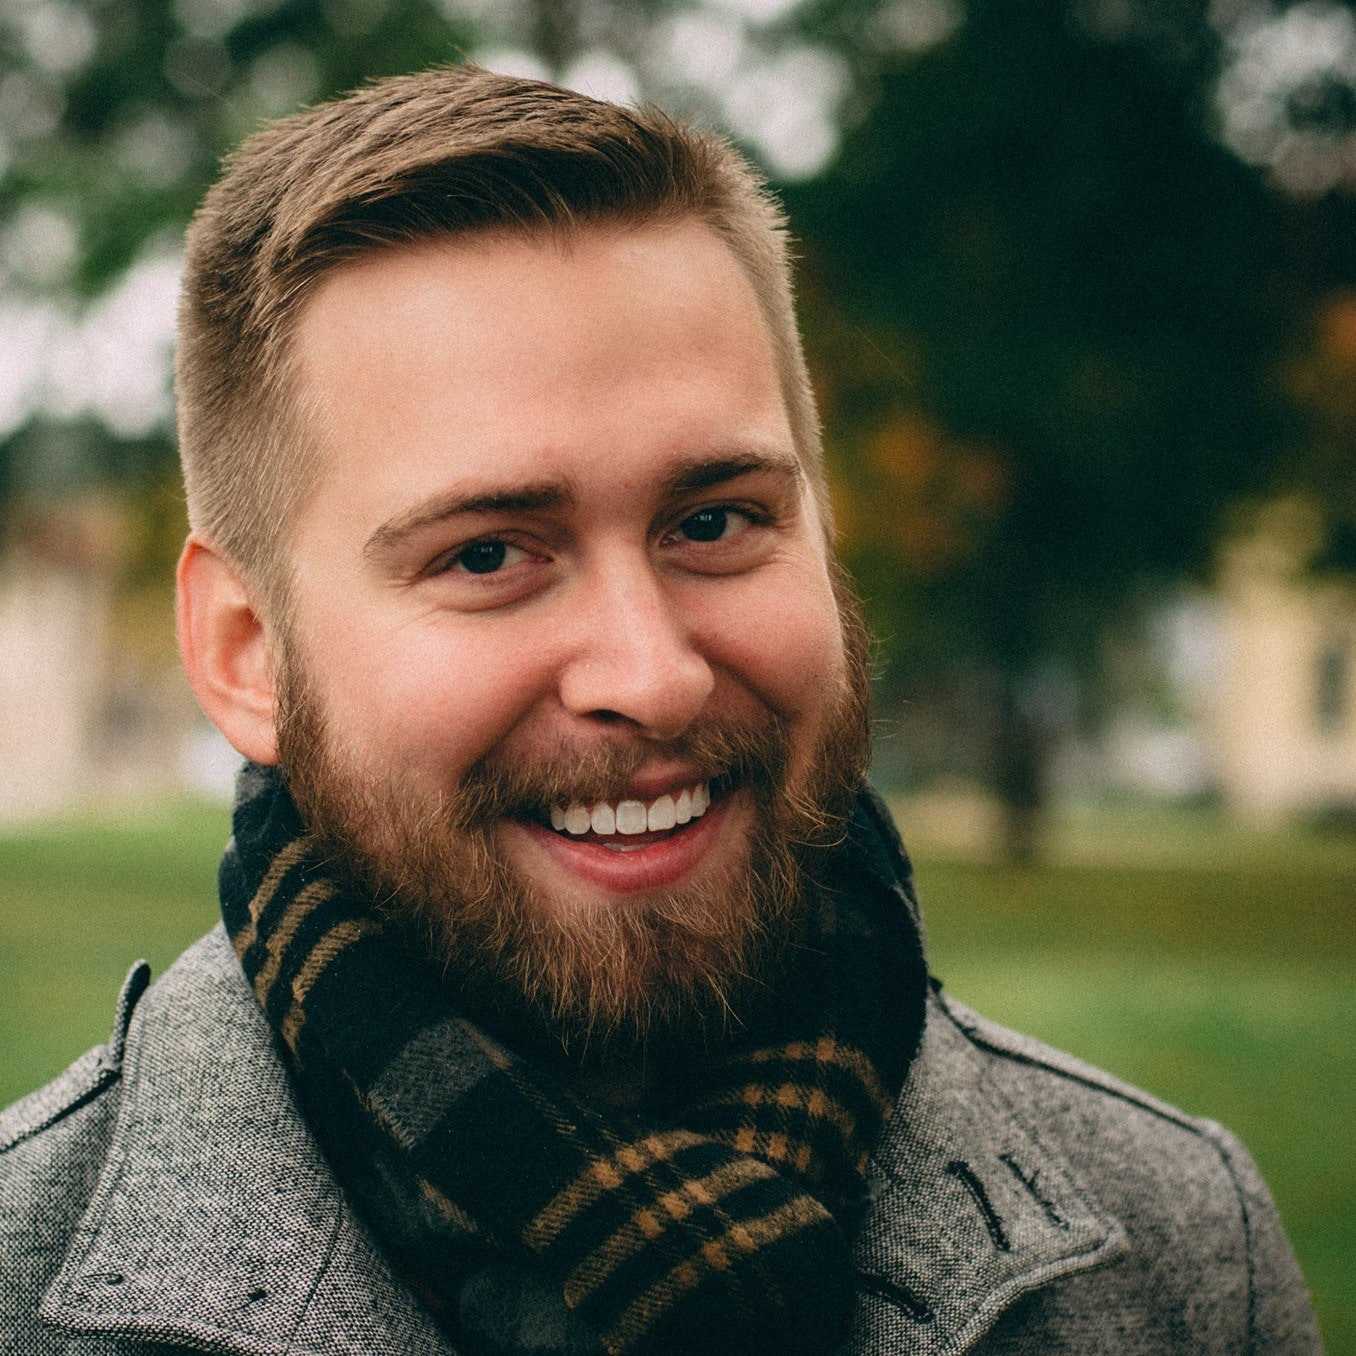 Erik Endres